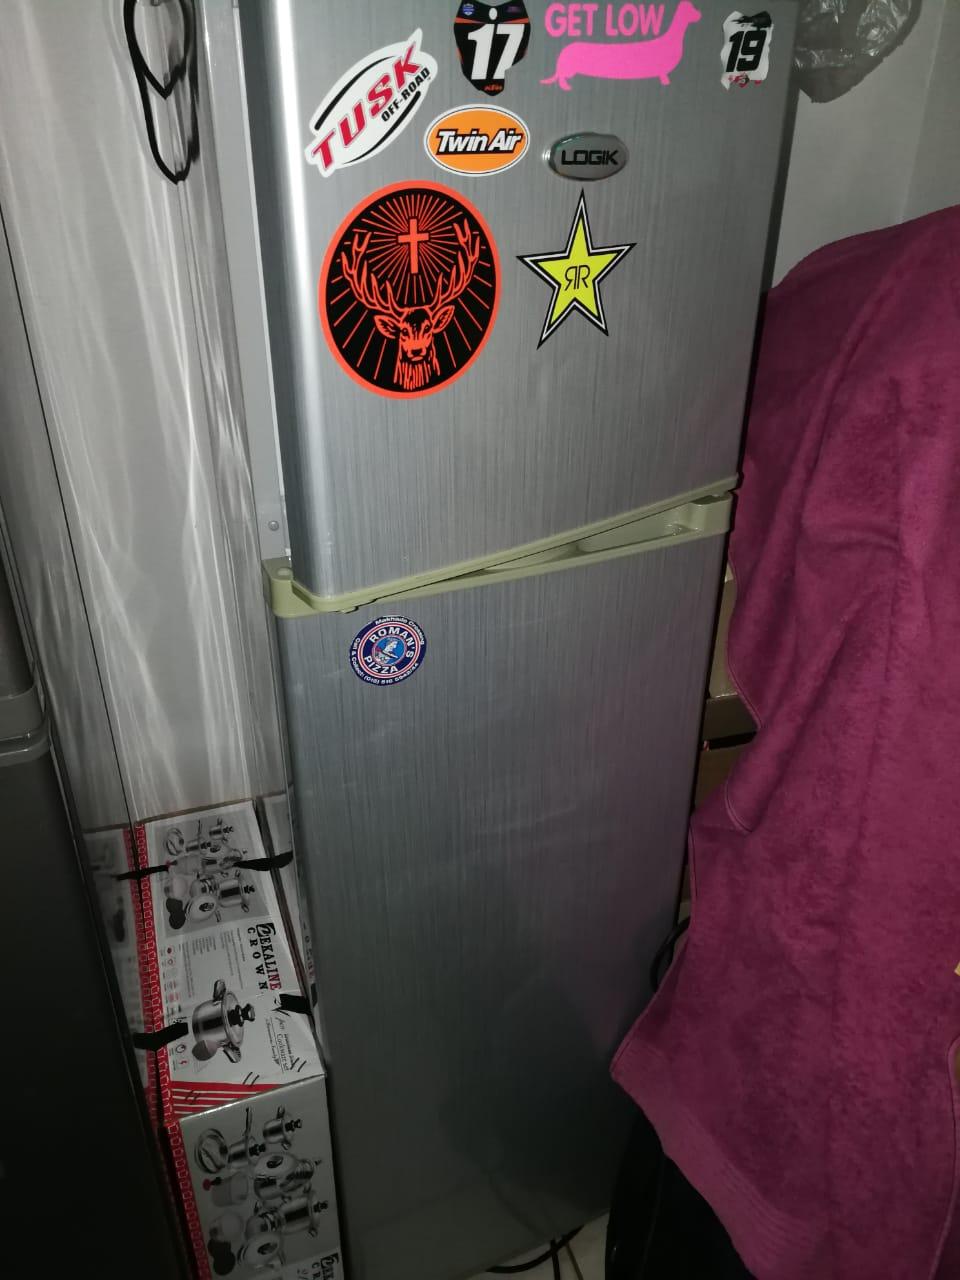 Logik fridge freezer for sale